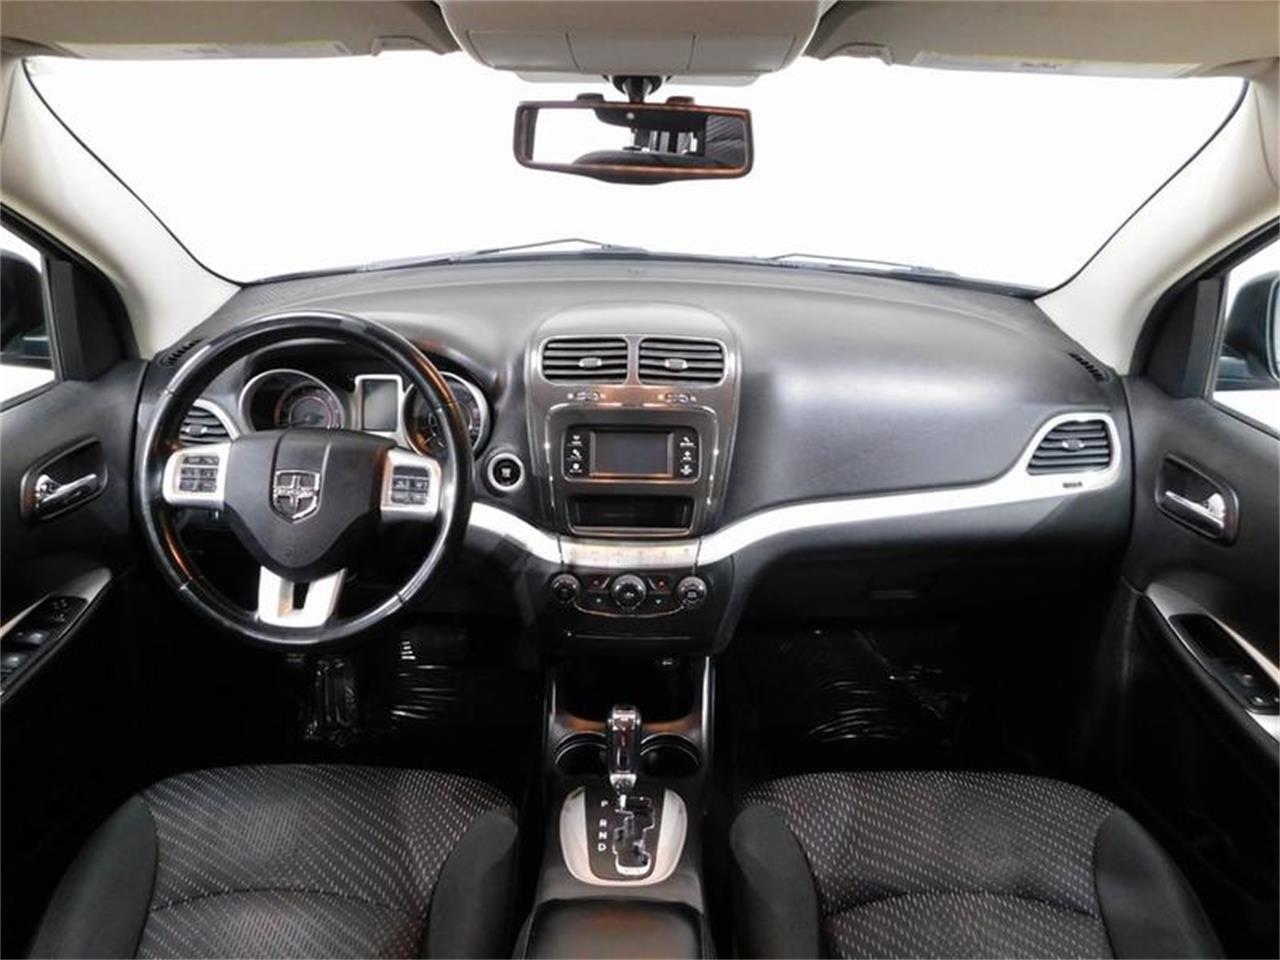 2016 Dodge Journey (CC-1295639) for sale in Hamburg, New York